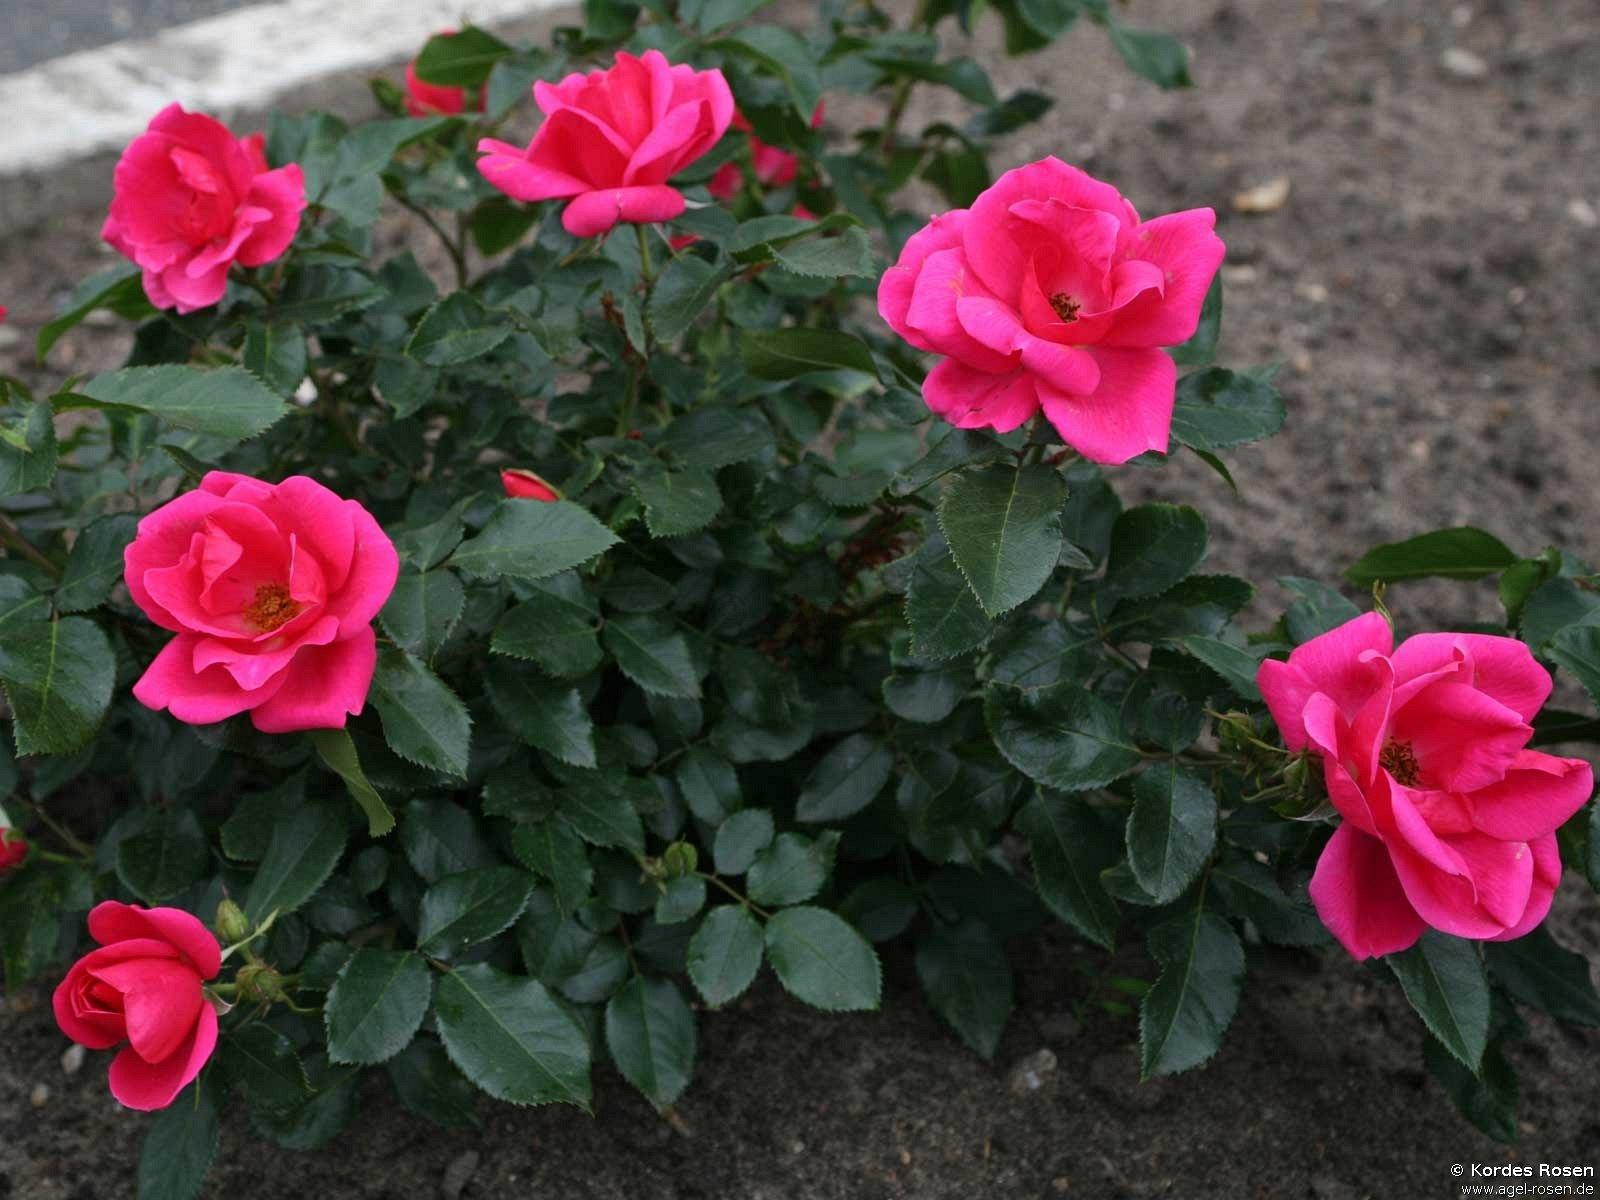 agel rosen ausmas english rose buy at agel rosen ledreborg floribunda rose buy at agel rosen. Black Bedroom Furniture Sets. Home Design Ideas